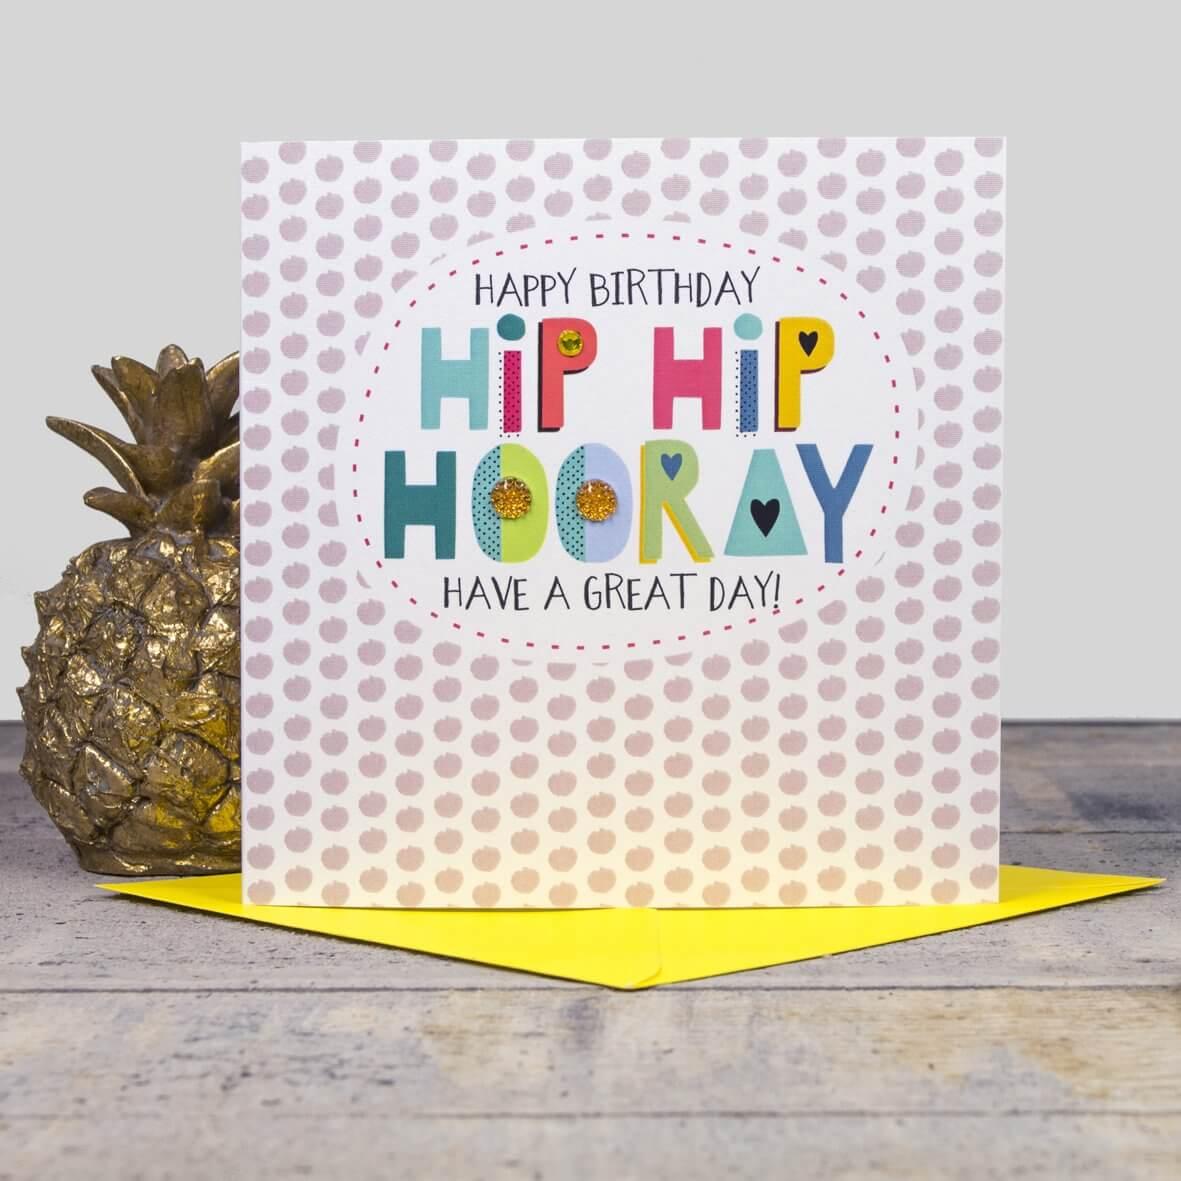 Happy Birthday Hip Hip Hooray Card